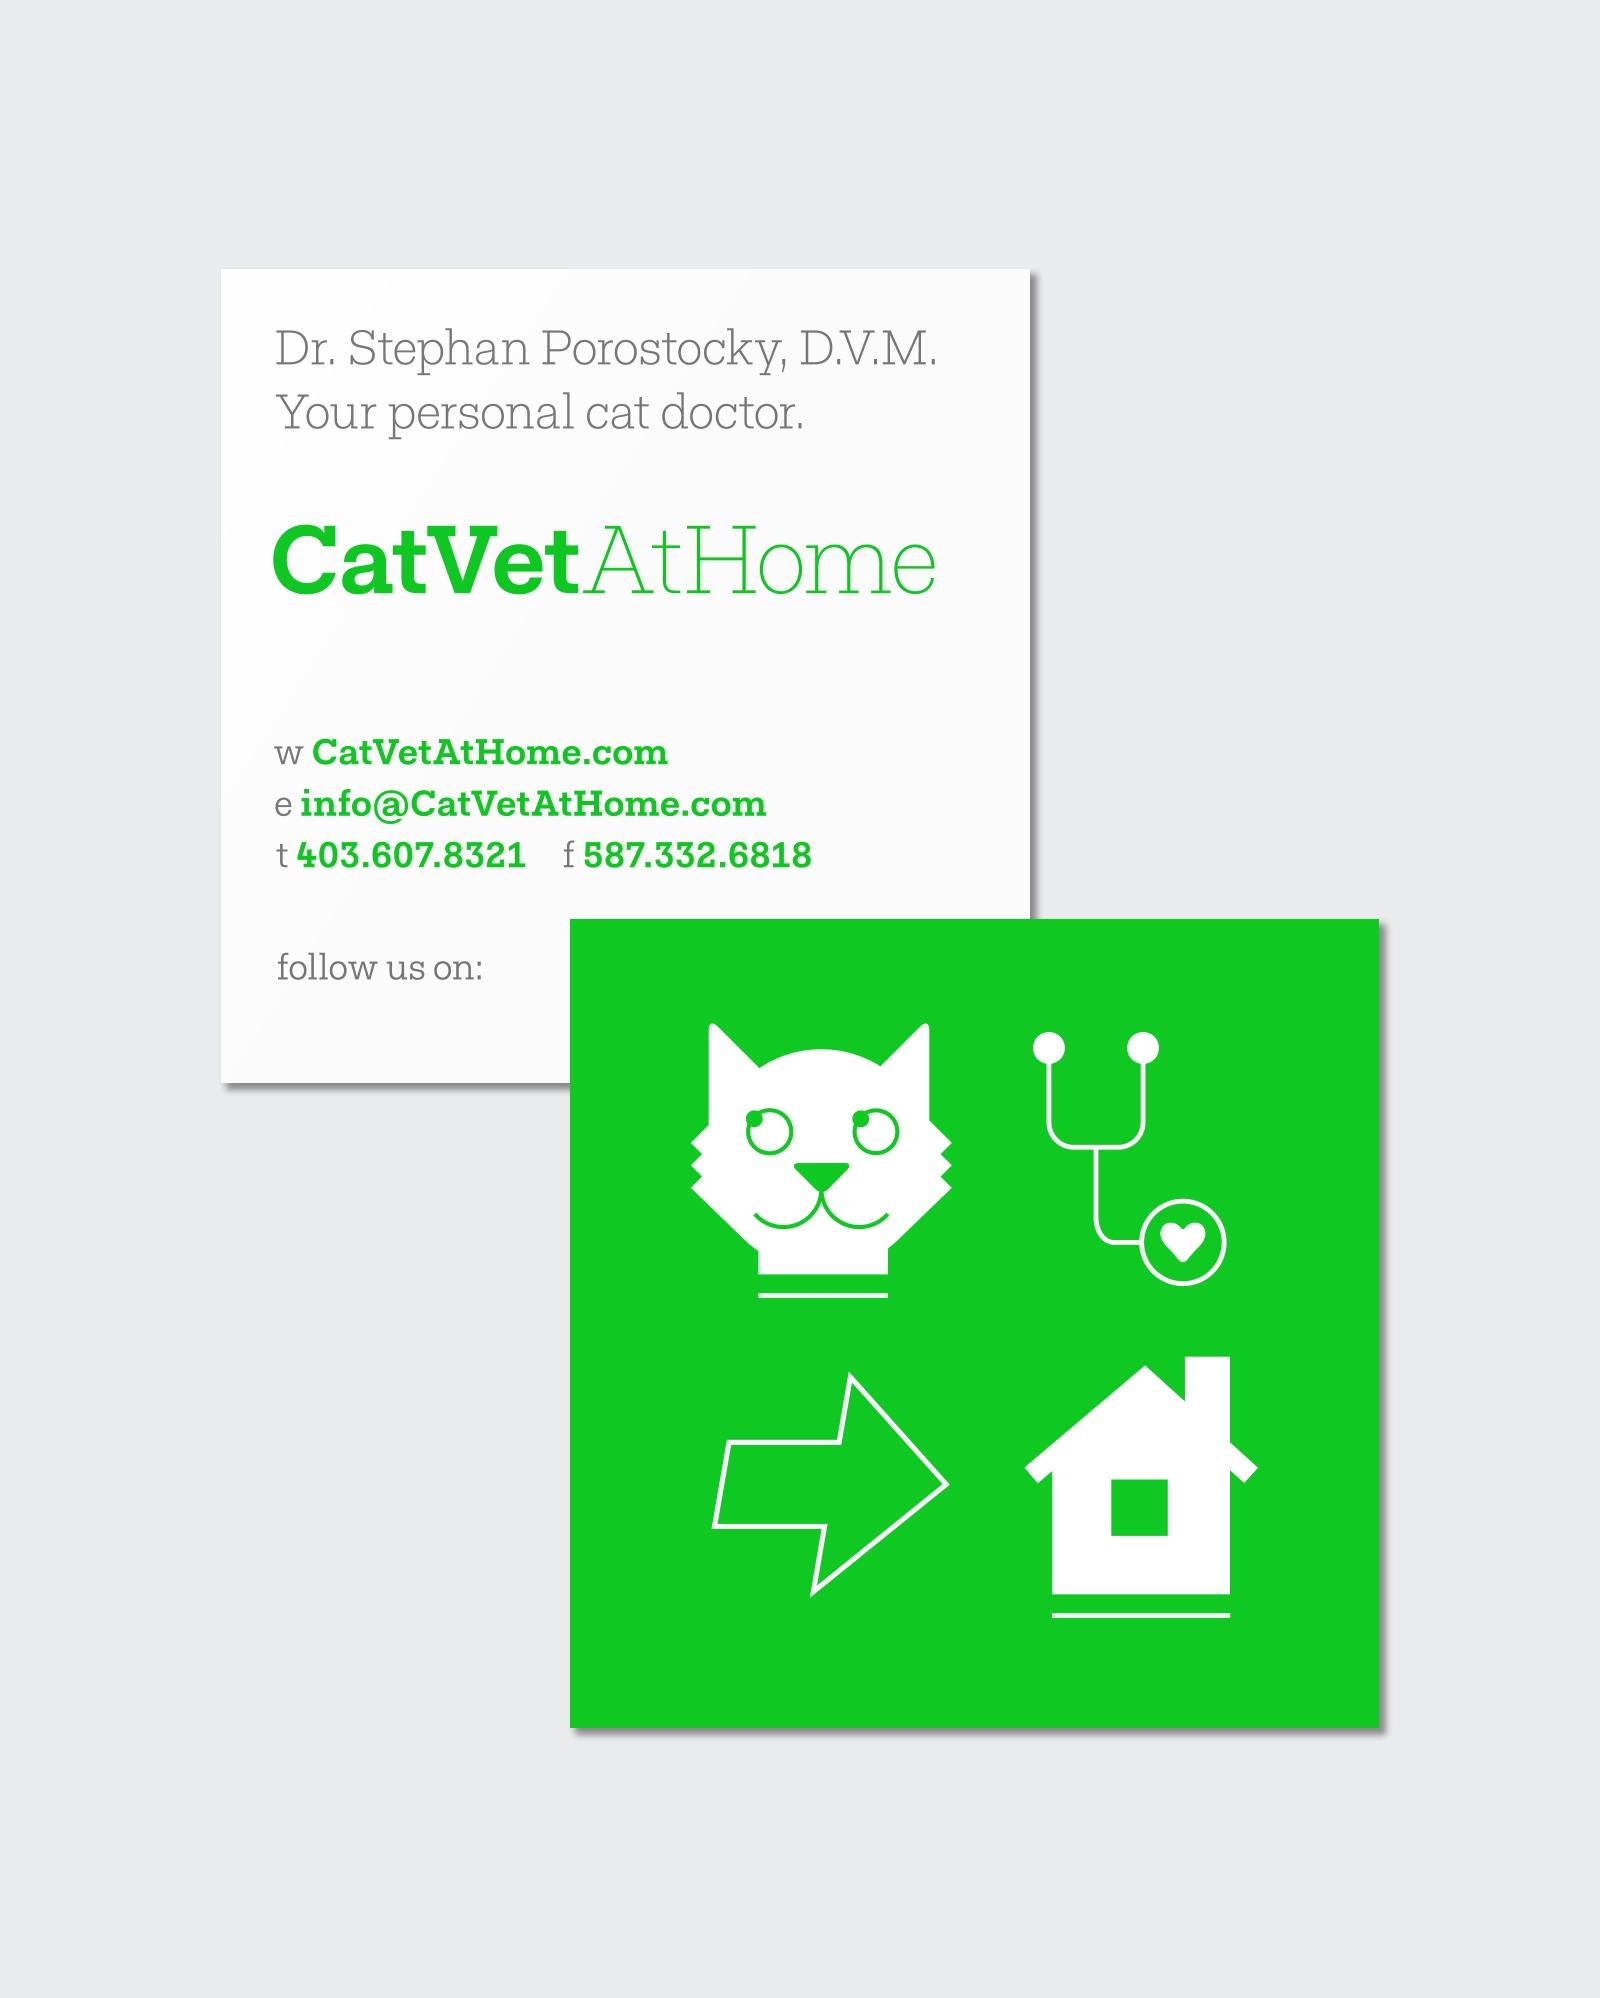 Cat Vet At Home business card design